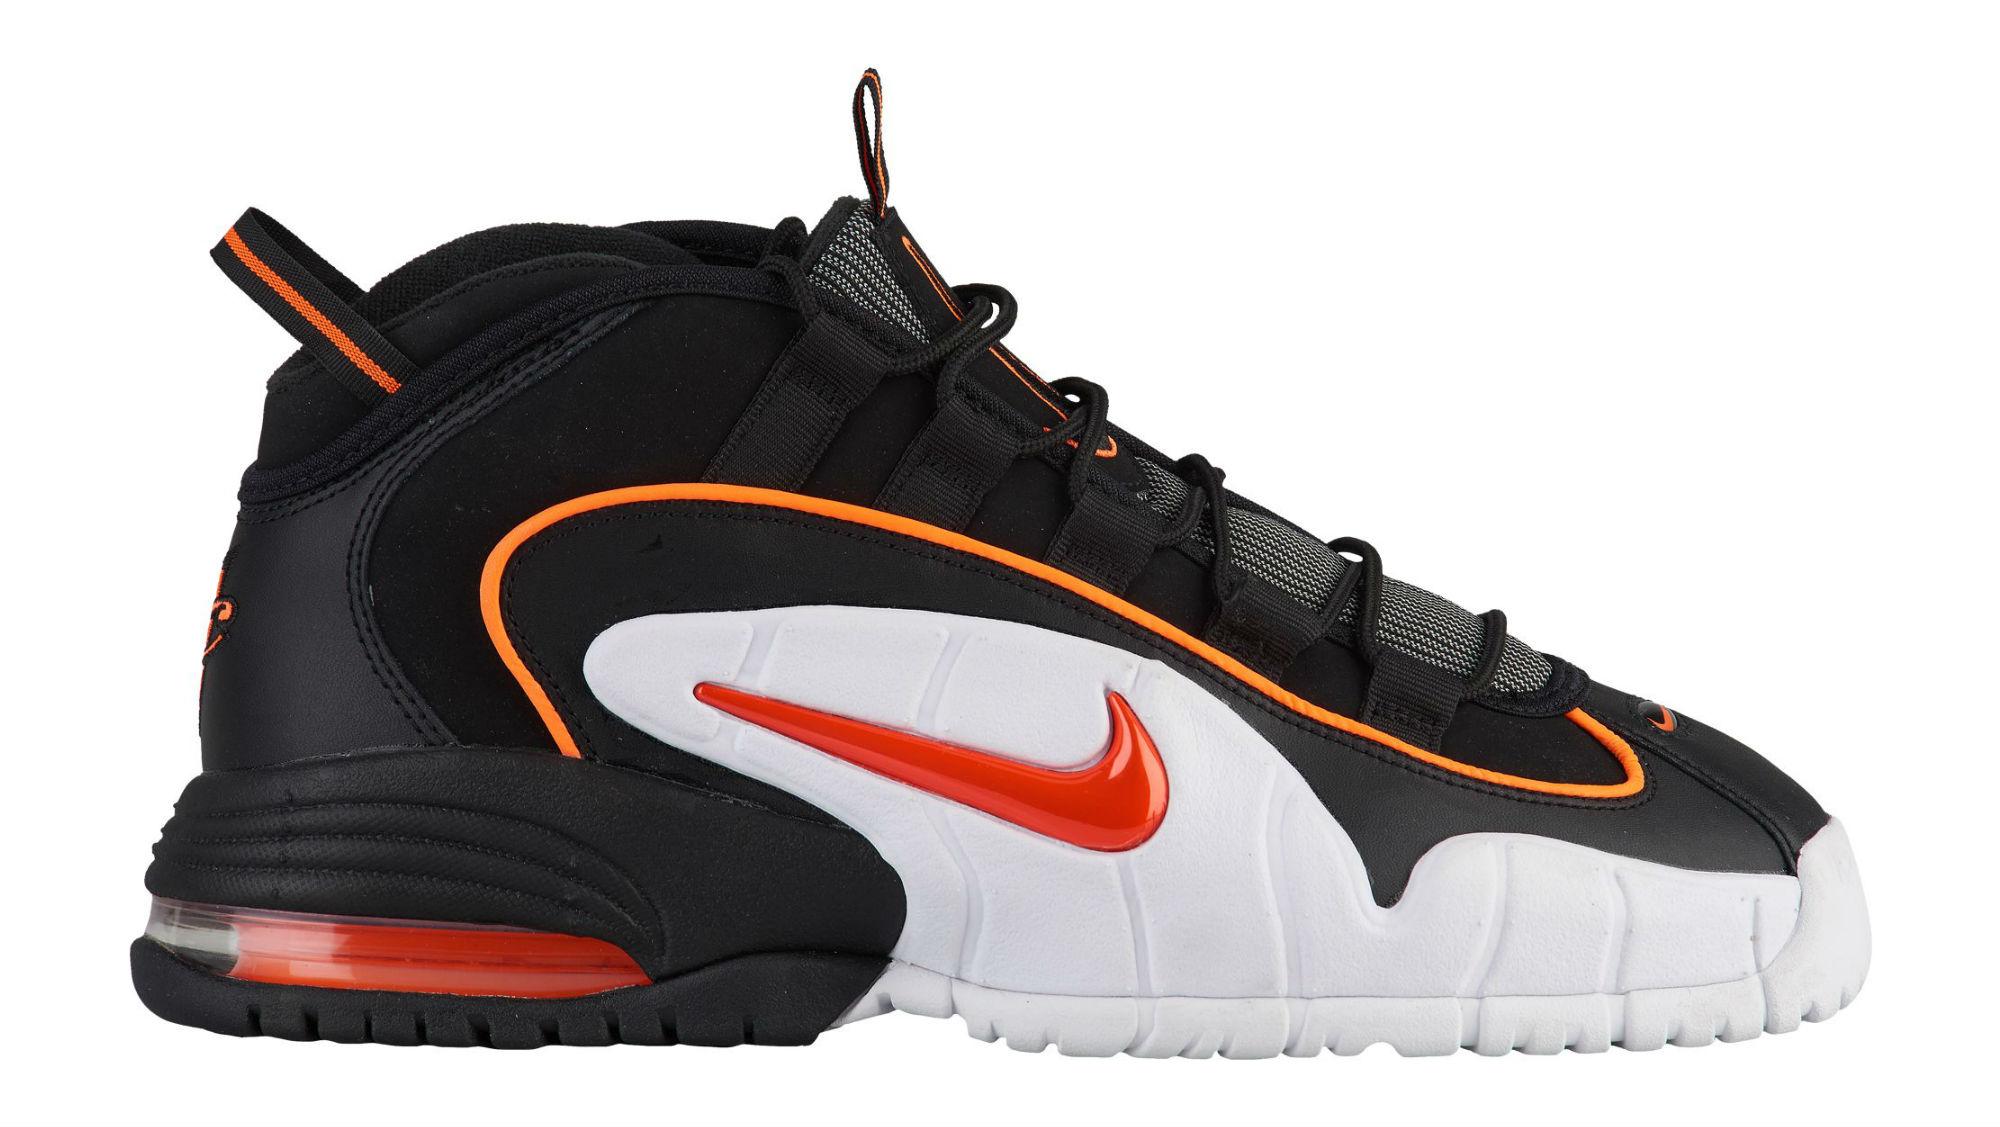 375dee60c2d37f Nike Air Max Penny 1 Black Total Orange White Release Date 685153-002